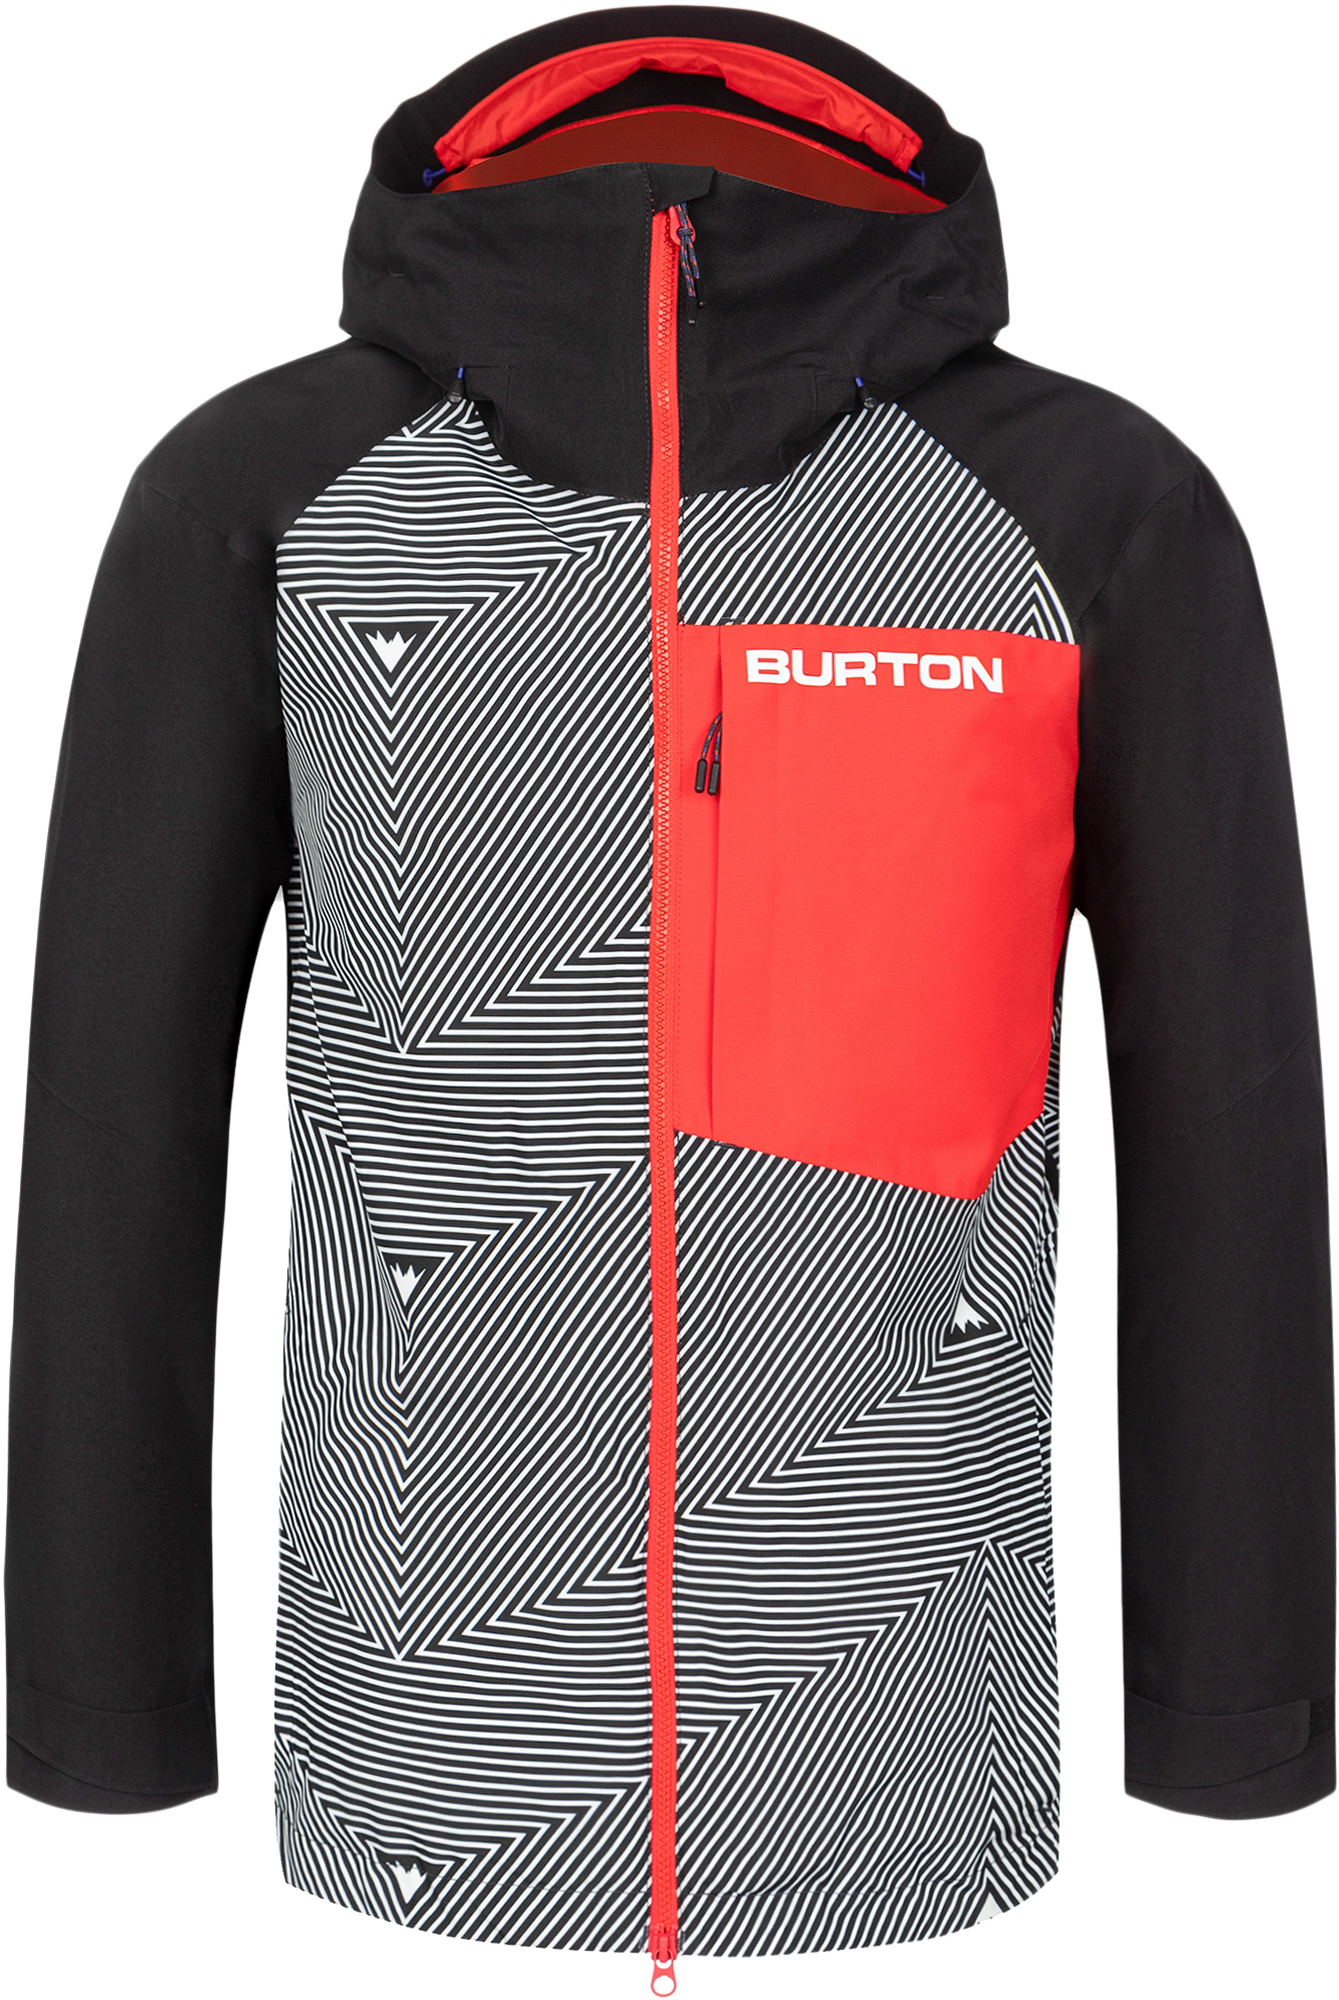 Burton Куртка утепленная мужская Burton Gore-Tex Radial, размер 46-48 burton куртка утепленная женская burton minturn размер 48 50